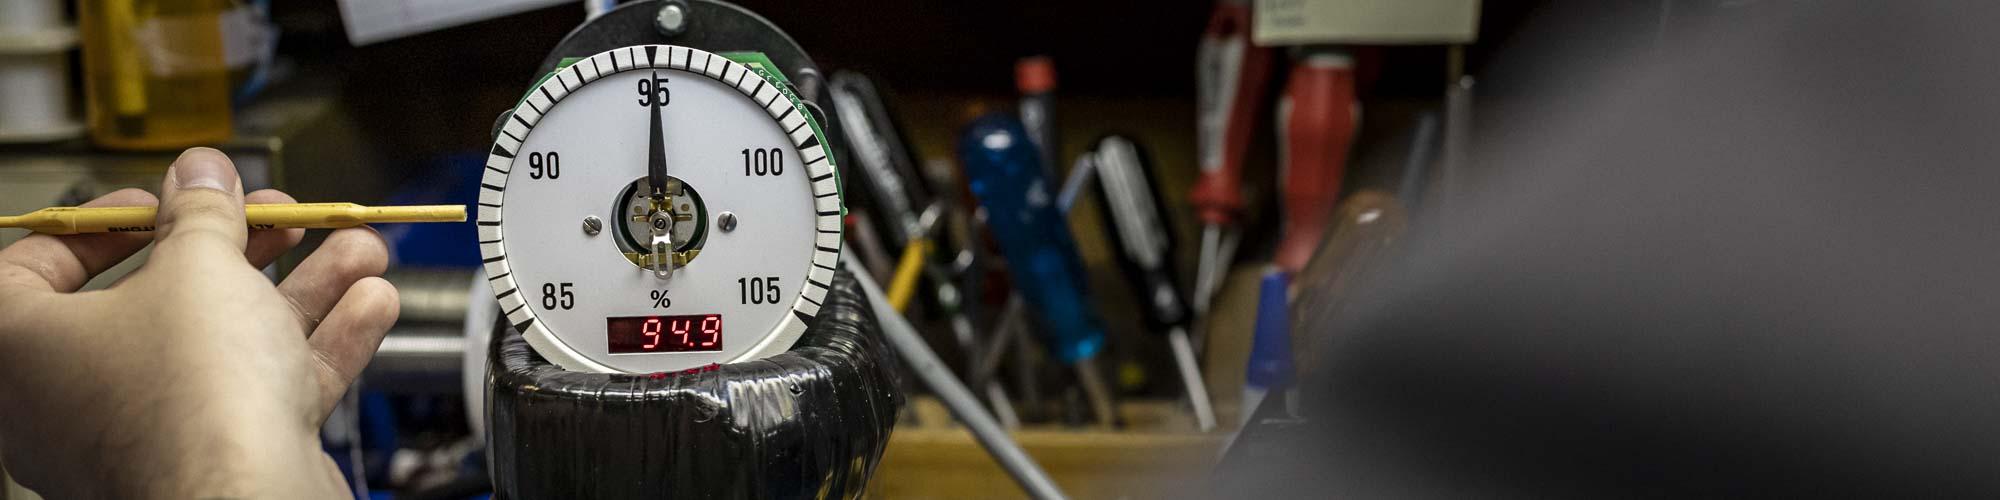 Switchboard Meter Header